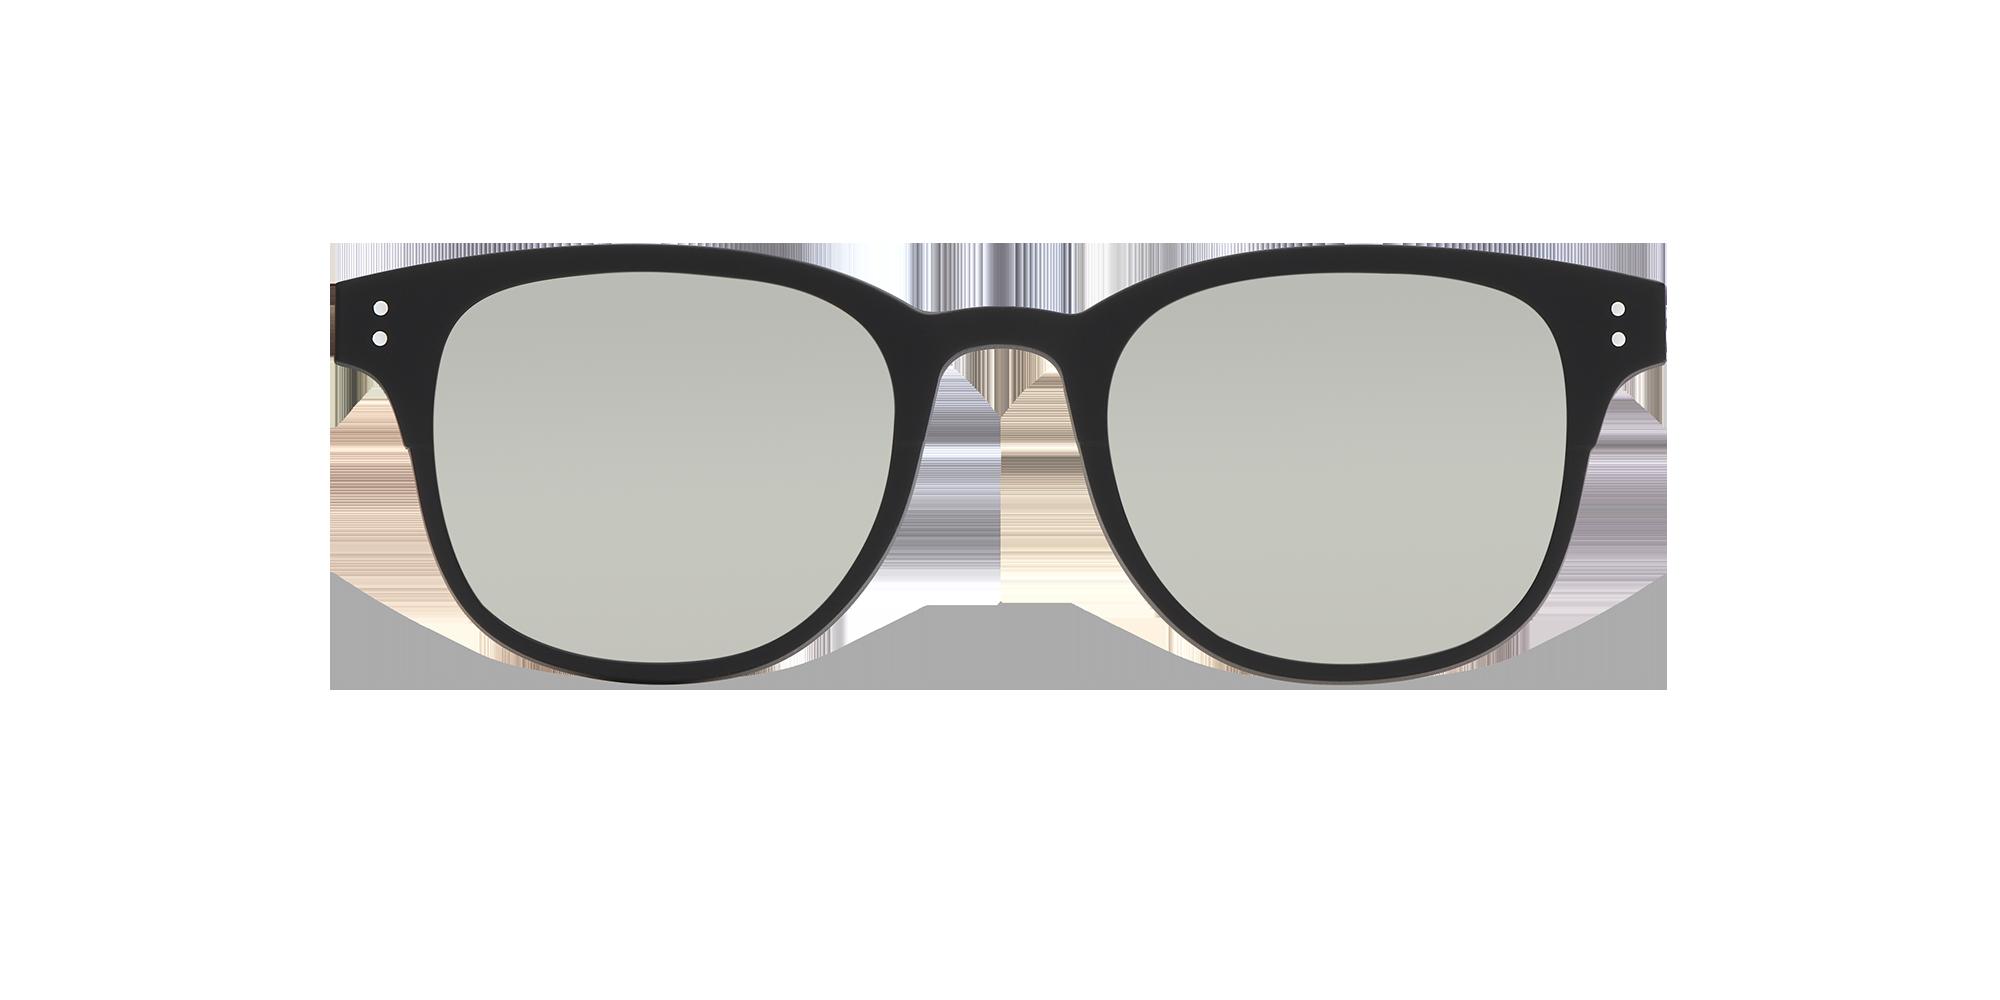 afflelou/france/products/smart_clip/clips_glasses/TMK34R3BK015021.png